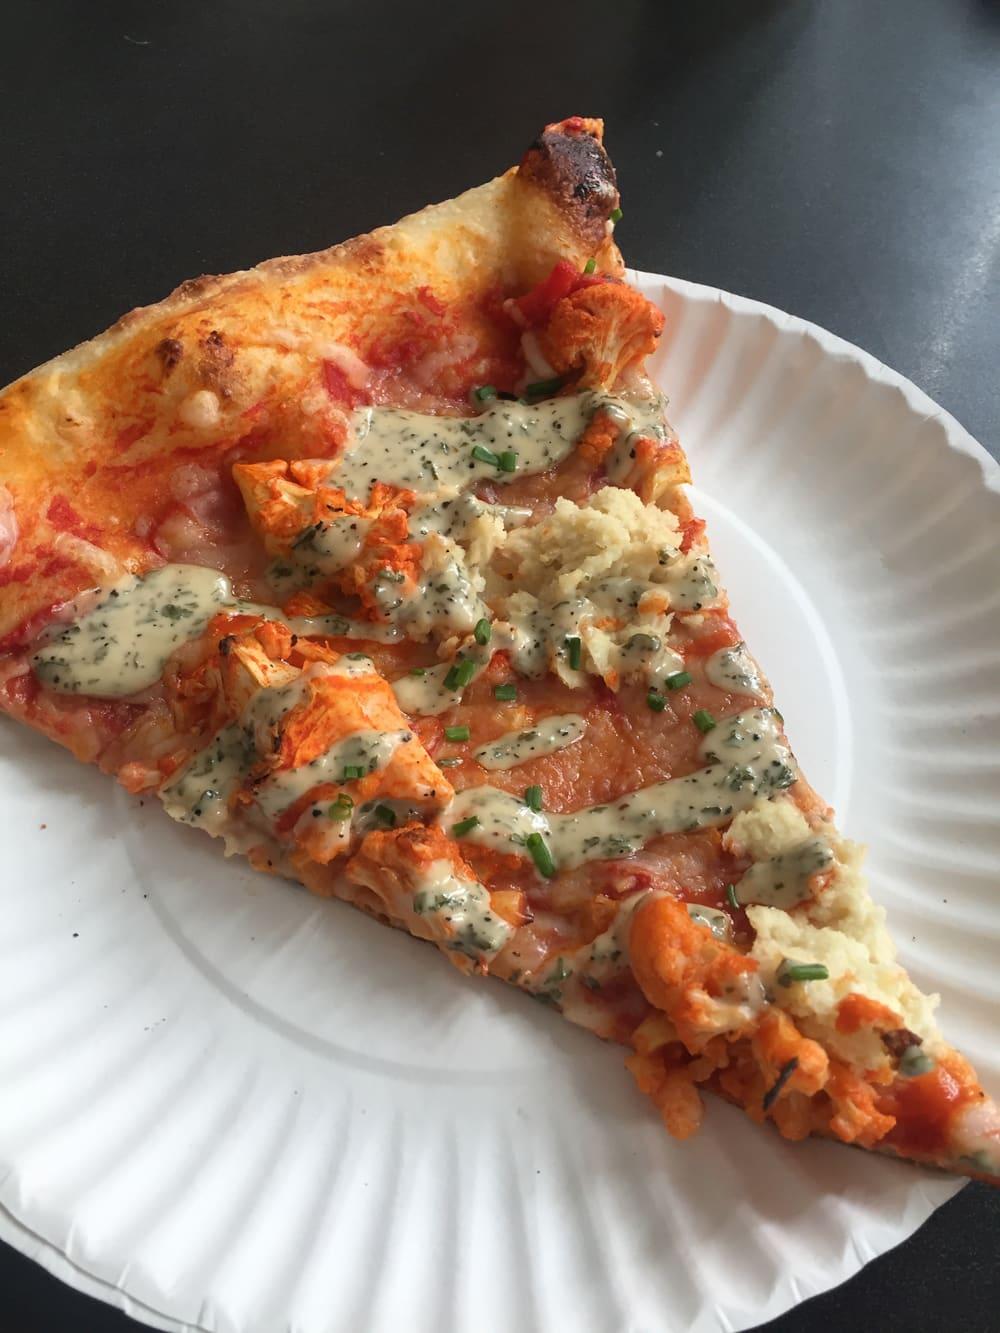 Best Vegetarian Restaurants in New York City